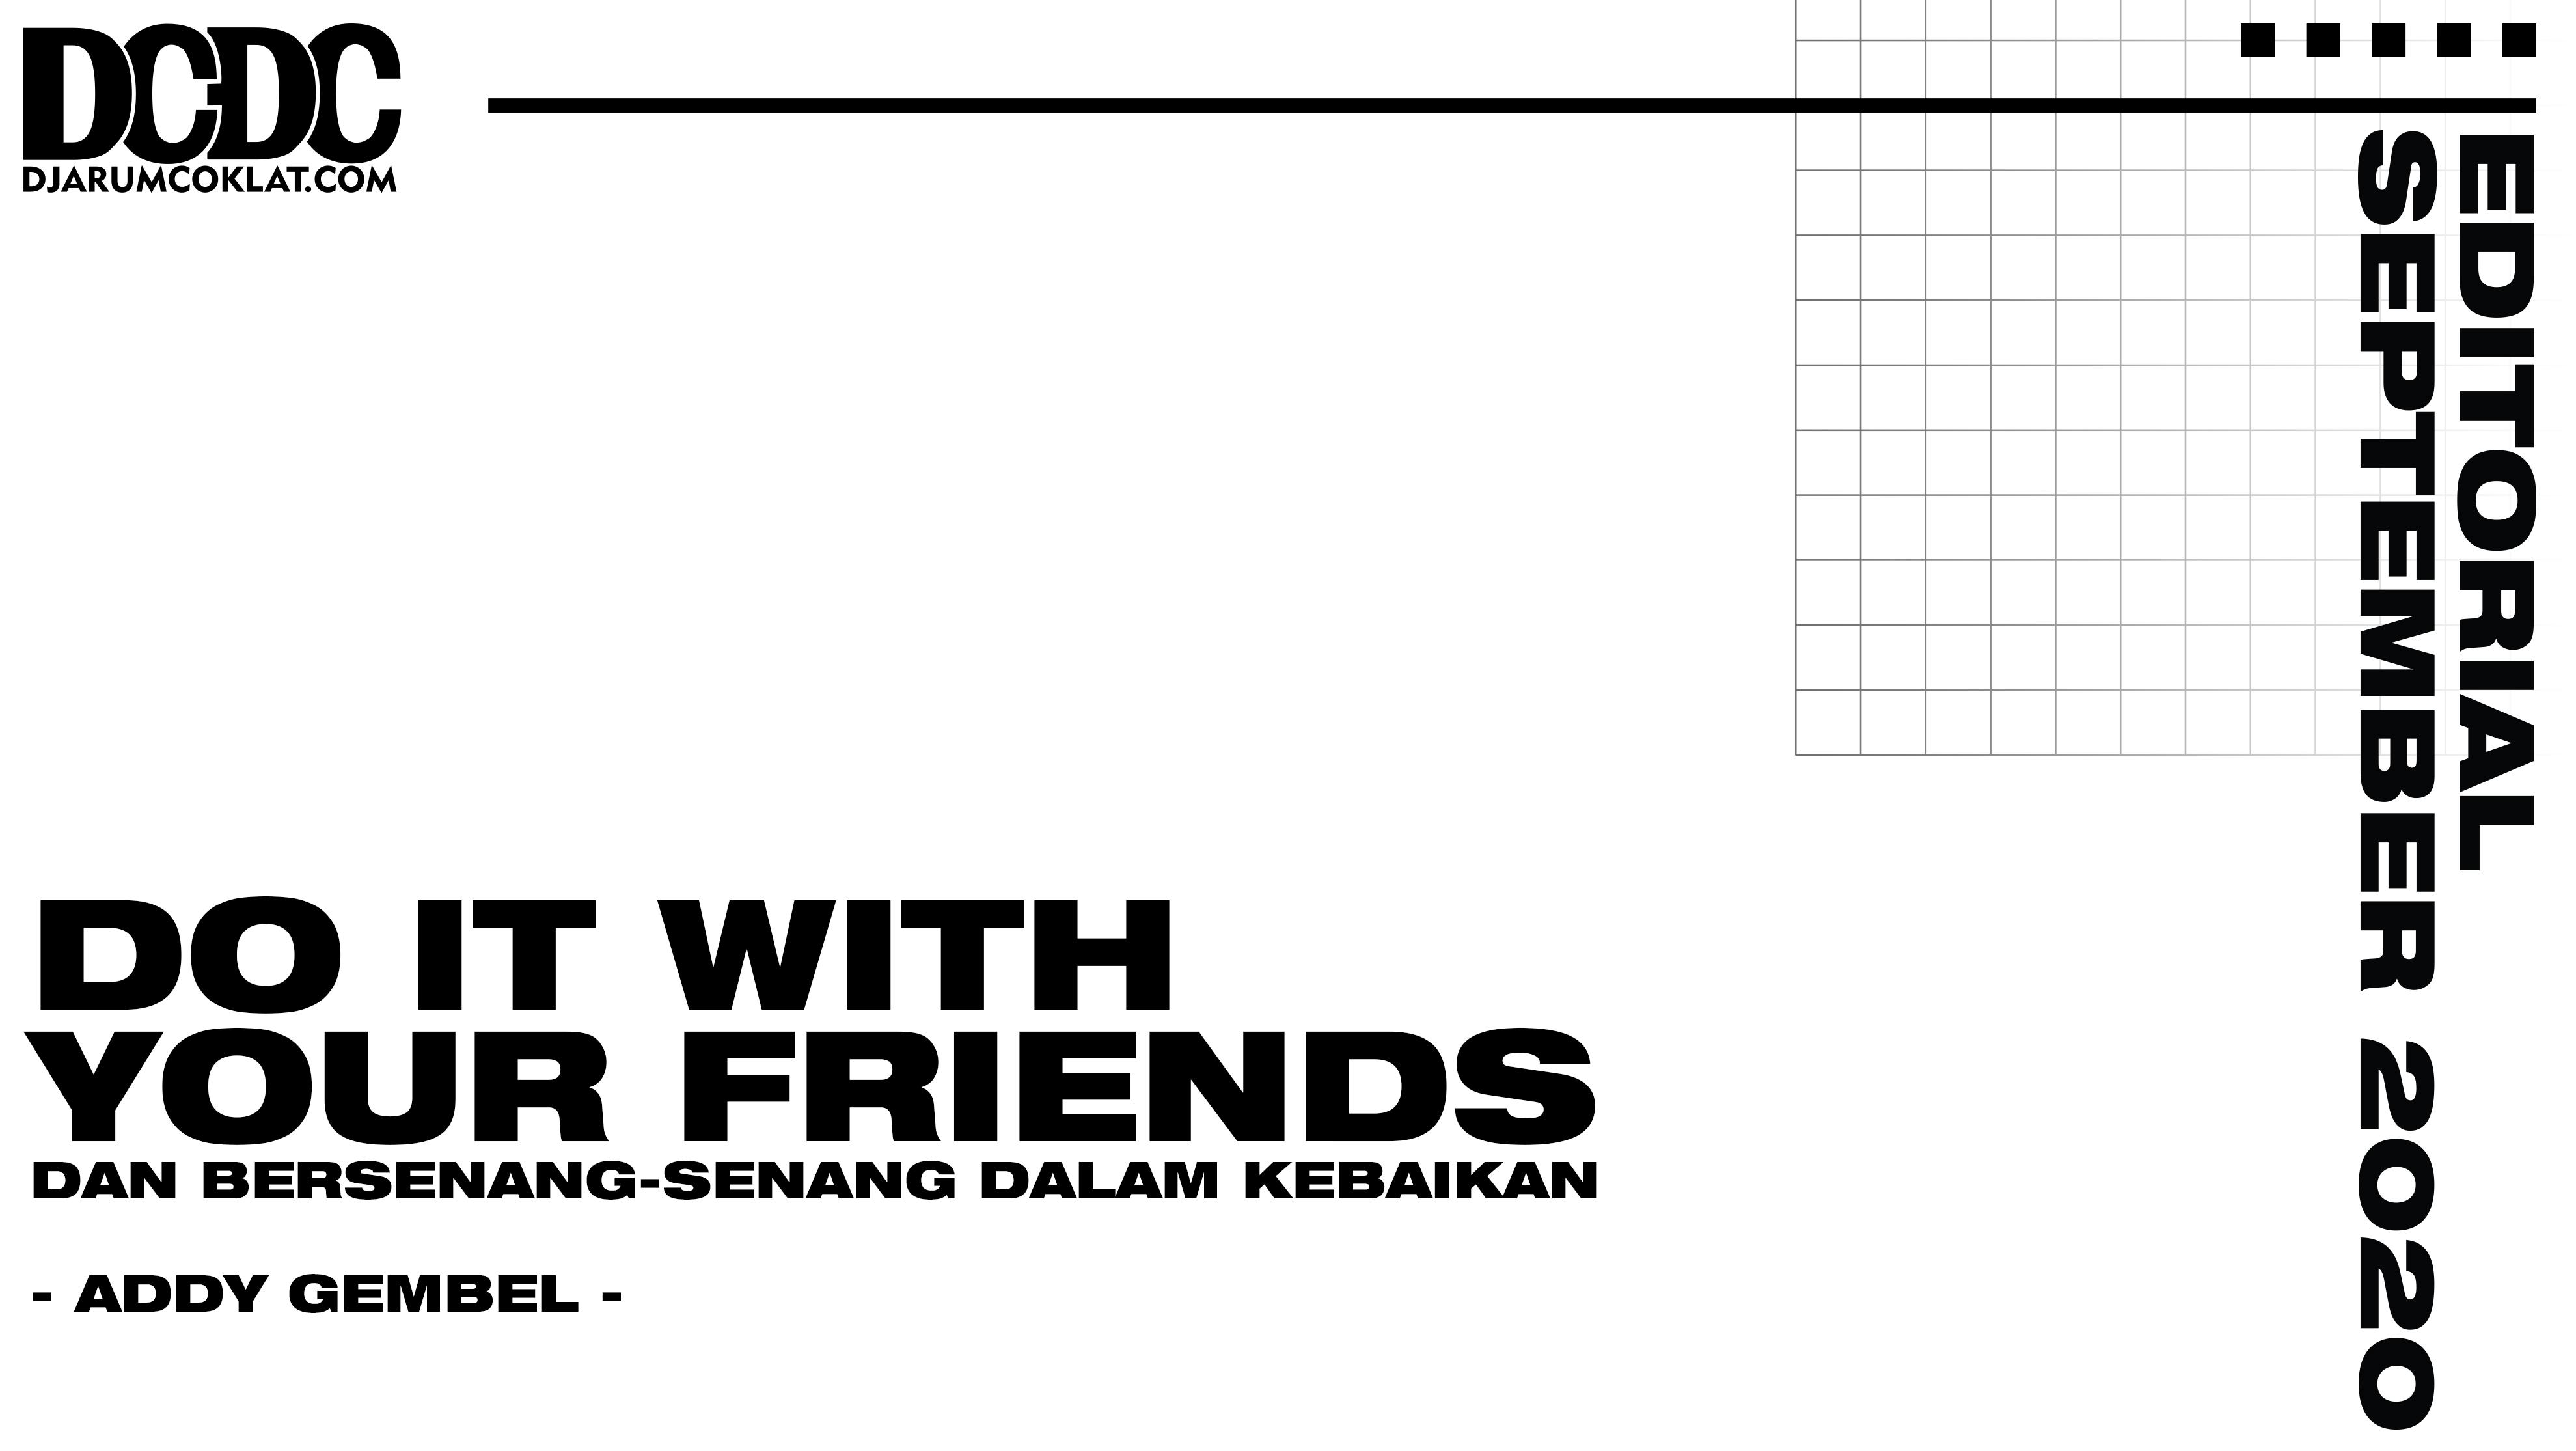 Do It With Your Friends Dan Bersenang-Senang Dalam Kebaikan